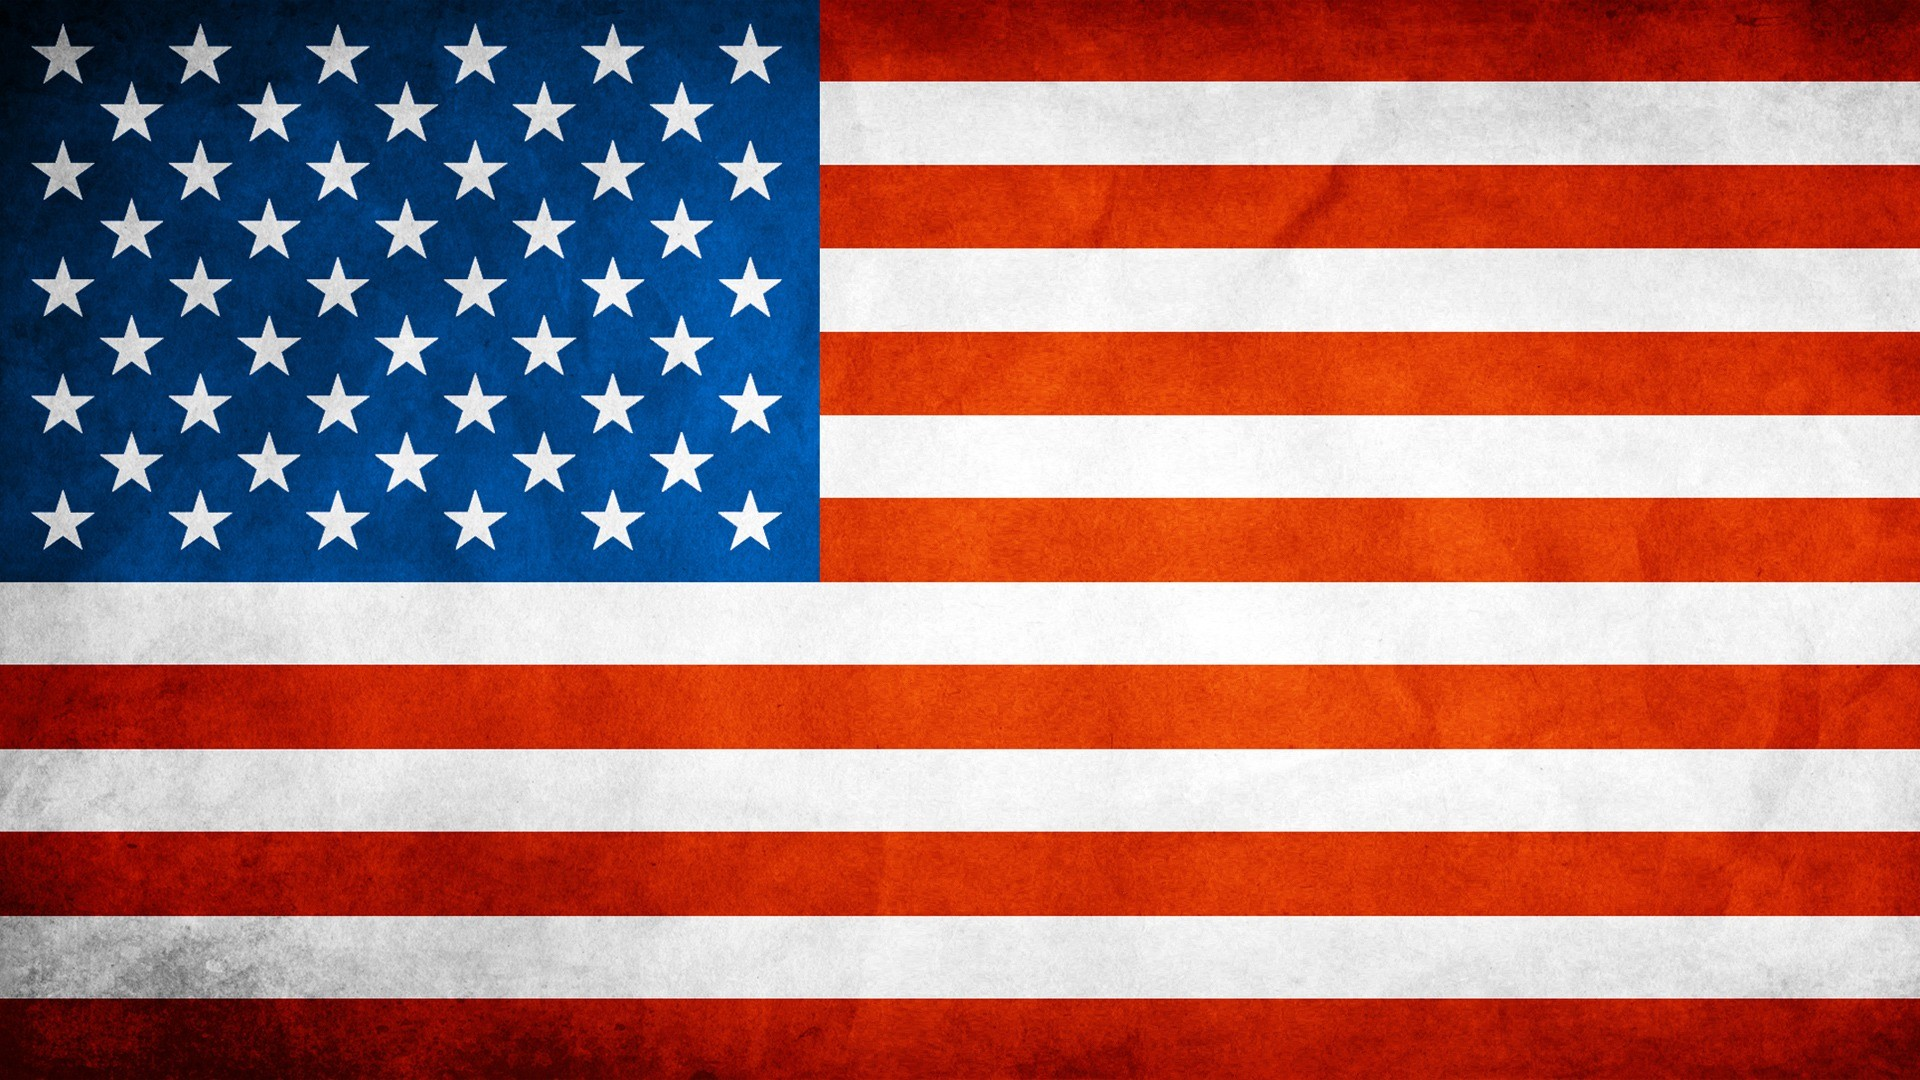 American USA Flags HD Wallpaper of Flag   hdwallpaper2013com 1920x1080